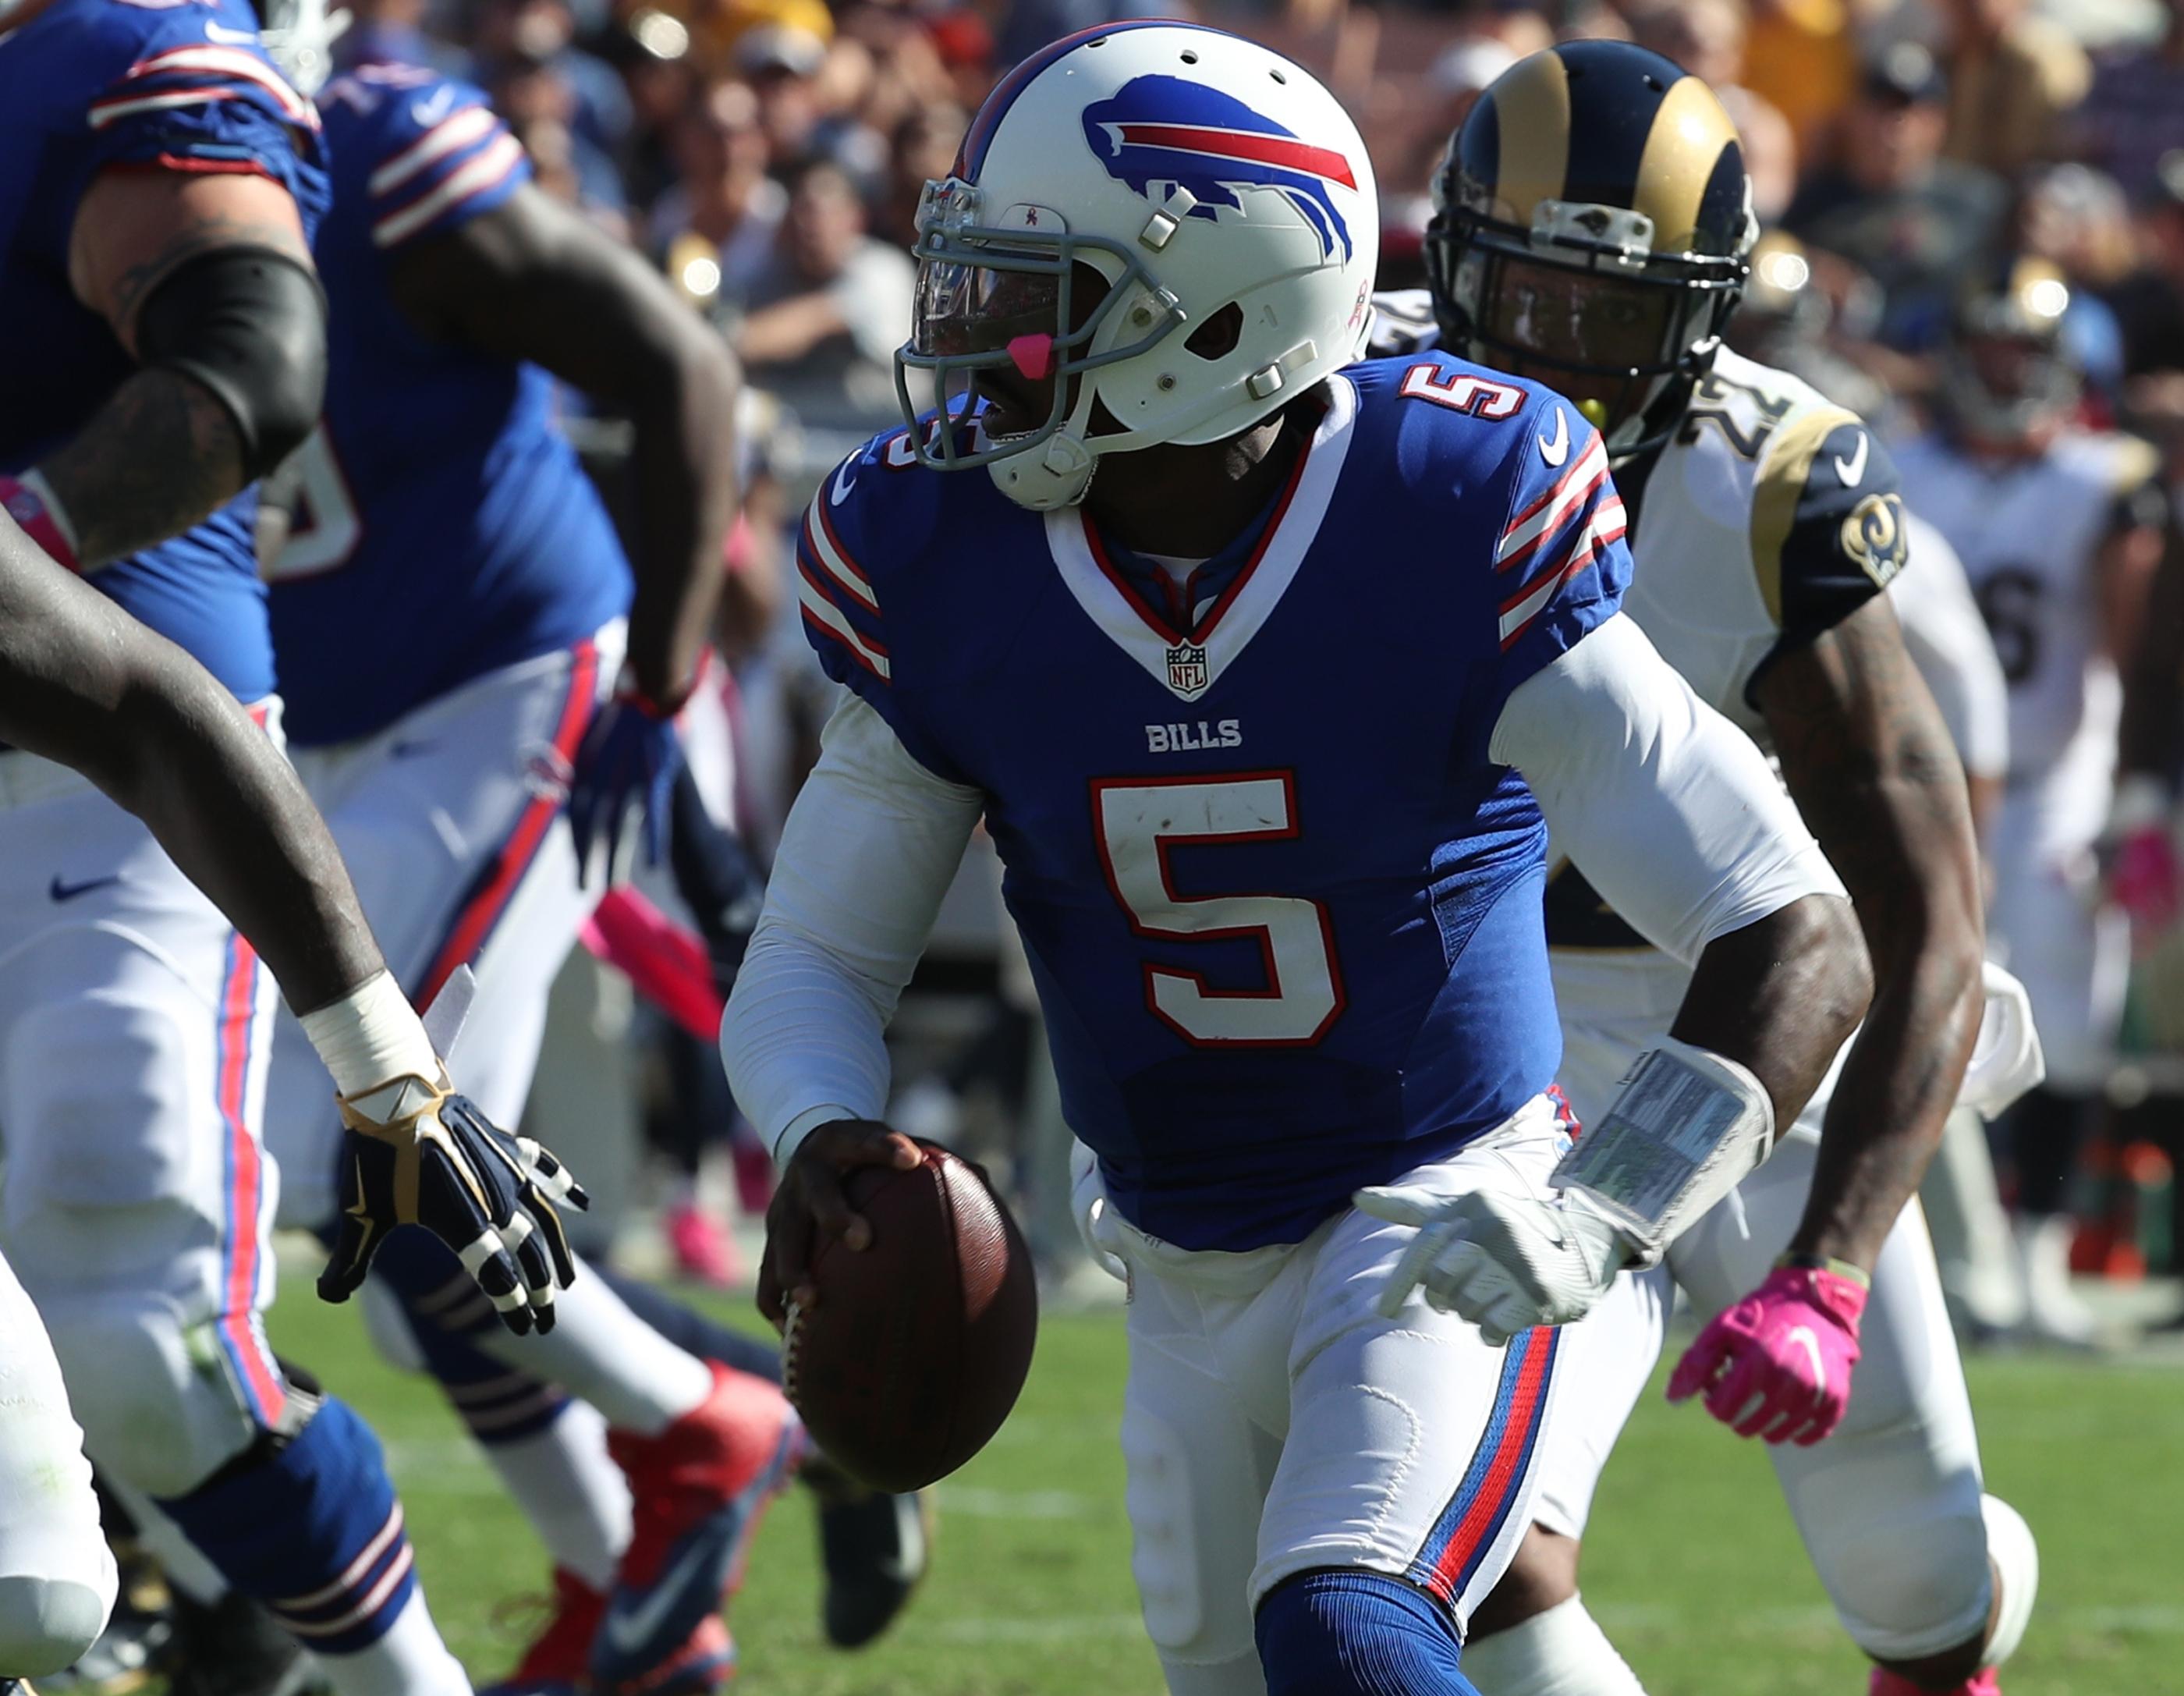 Buffalo Bills quarterback Tyrod Taylor (5) in the third quarter at Los Angeles Memorial Coliseum on Sunday, Oct. 9, 2016.  (James P. McCoy/Buffalo News)